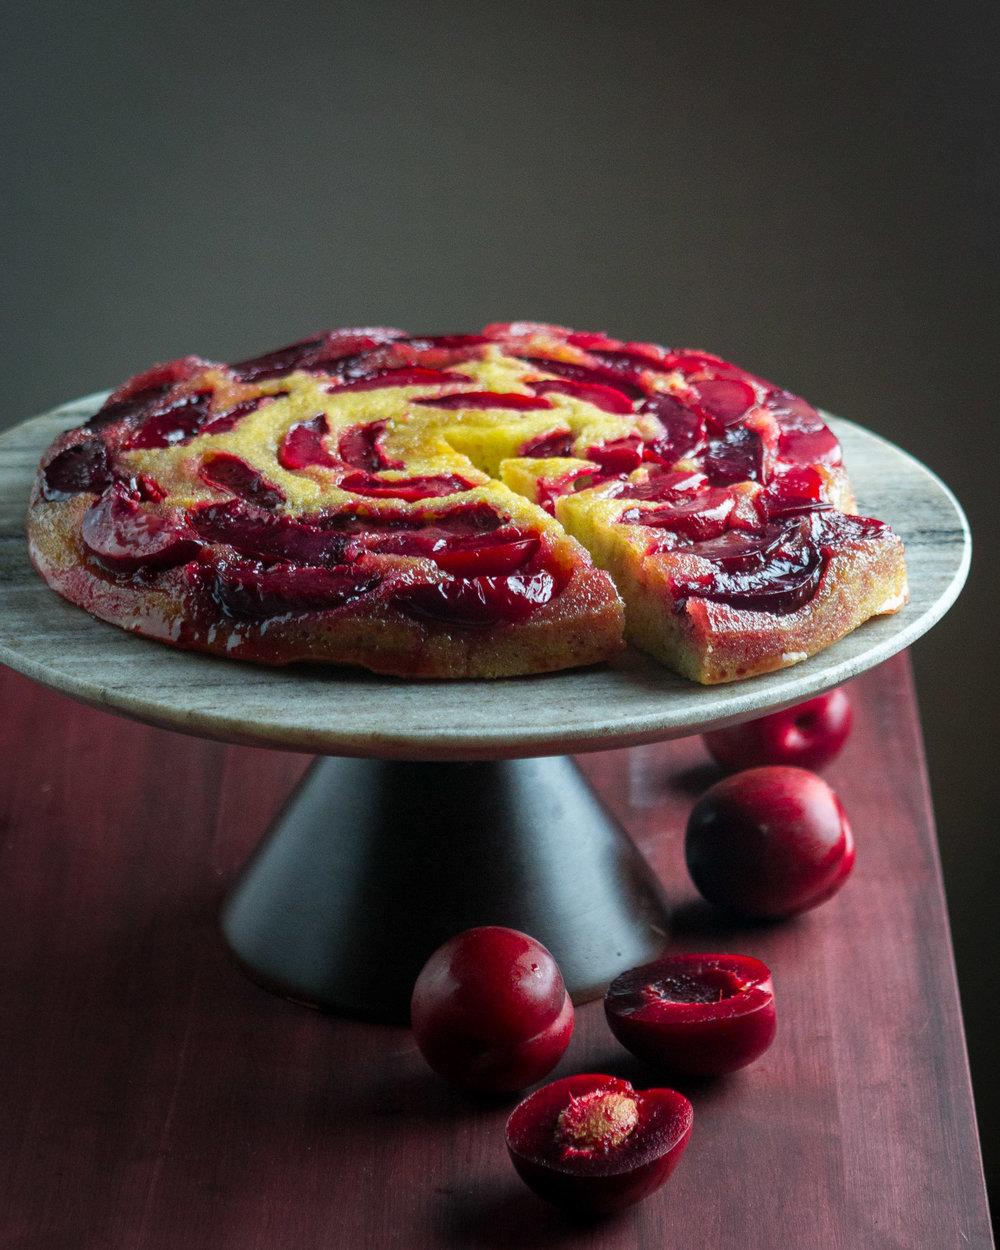 plum-upside-down-cake-9.jpg